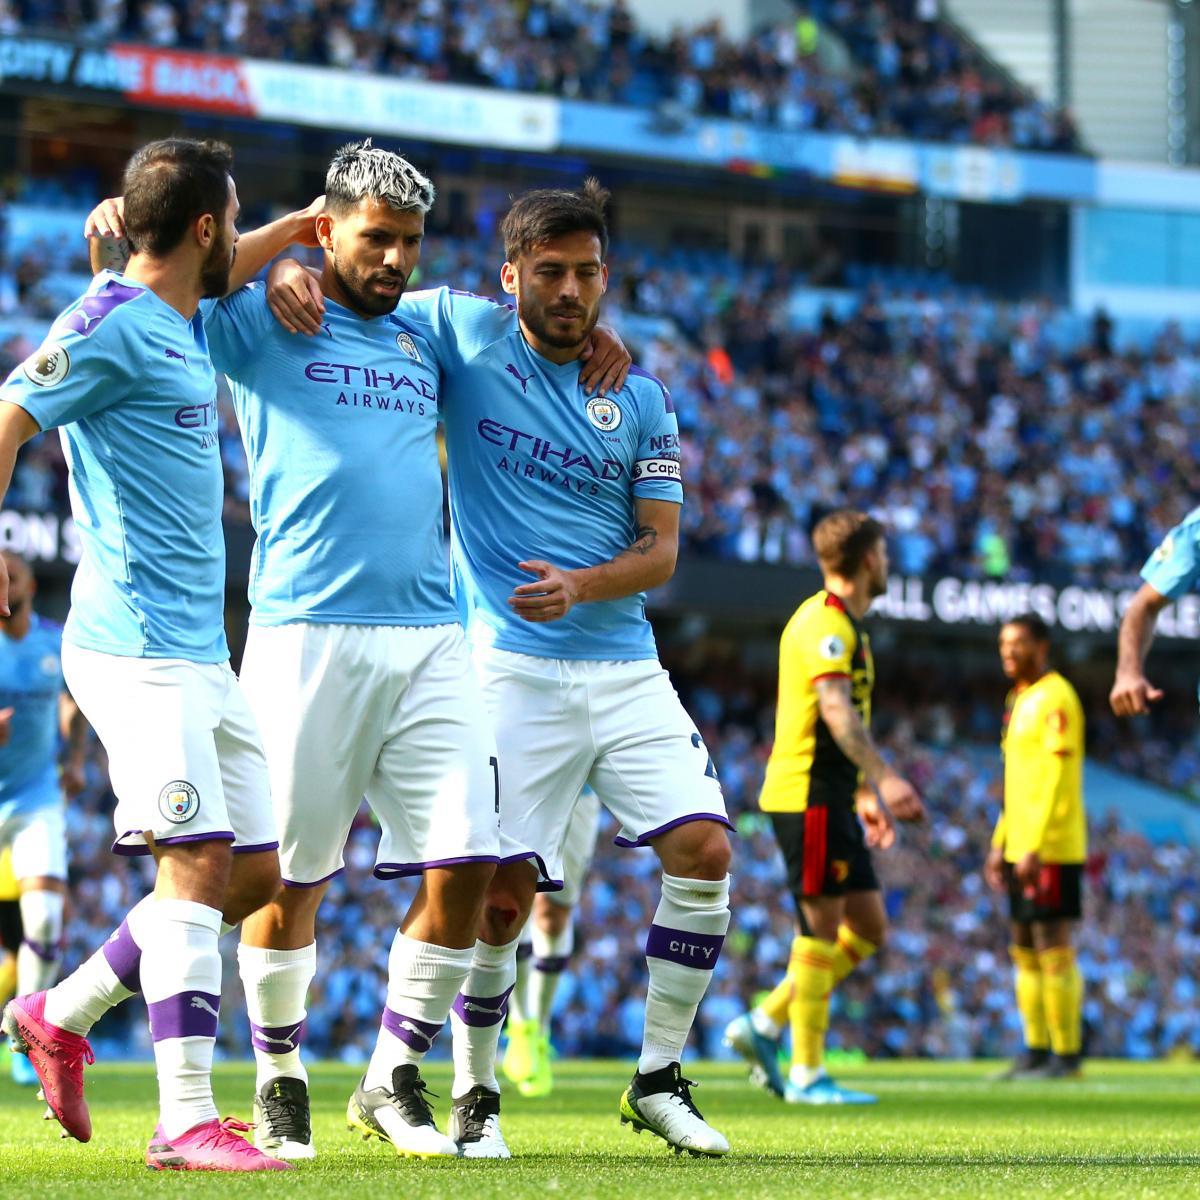 Manchester City vs. Preston: Odds, Live Stream for 2019 EFL Cup